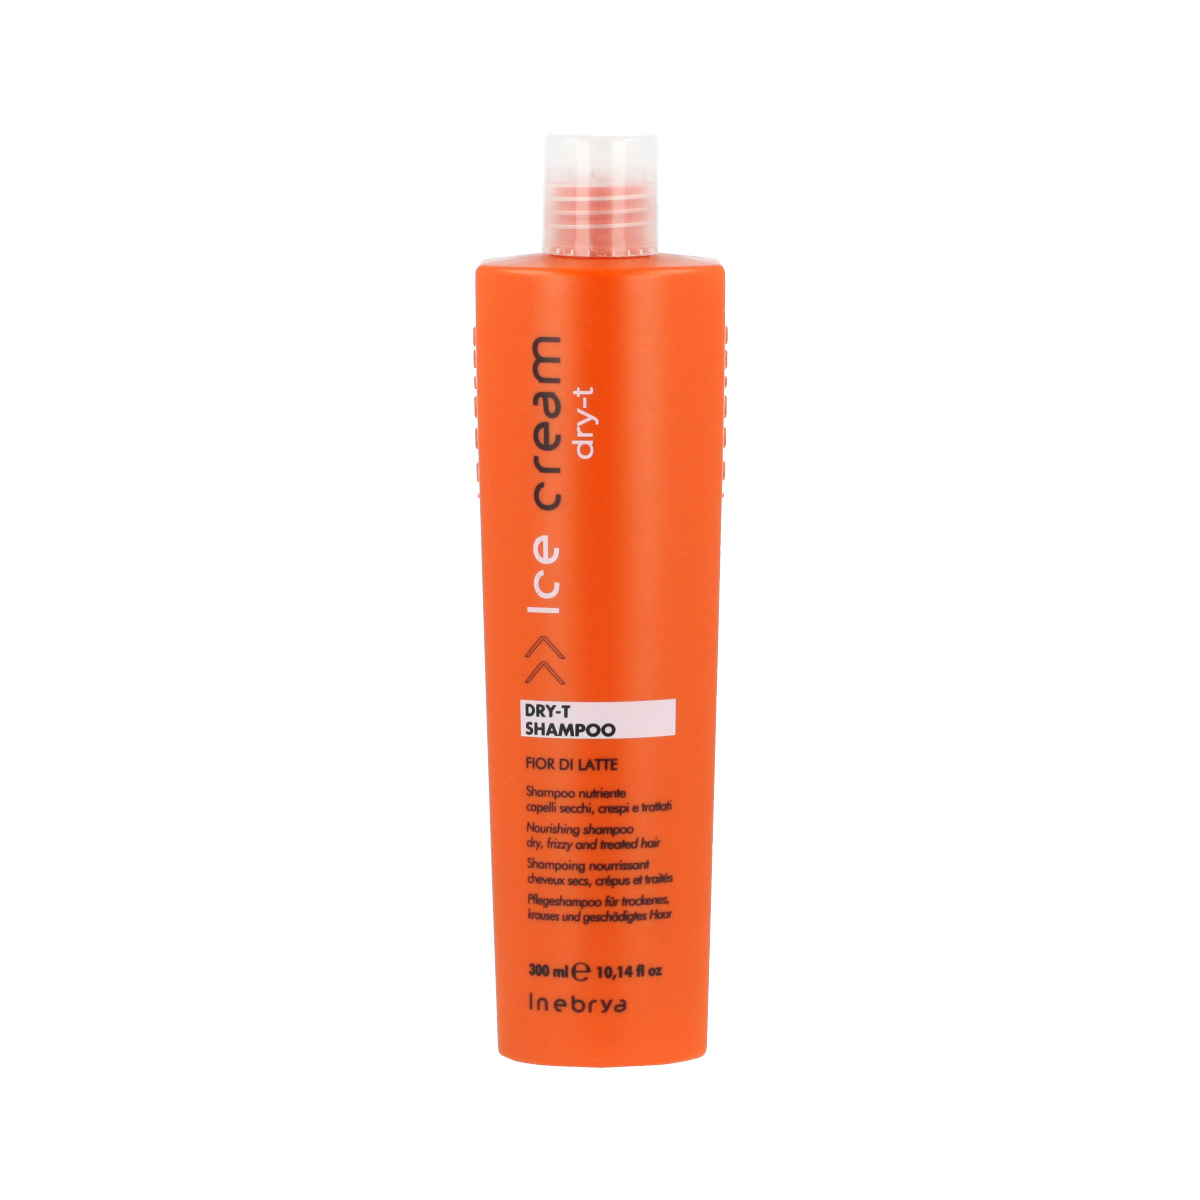 Inebrya Dry-T Shampoo 300 ml 94179